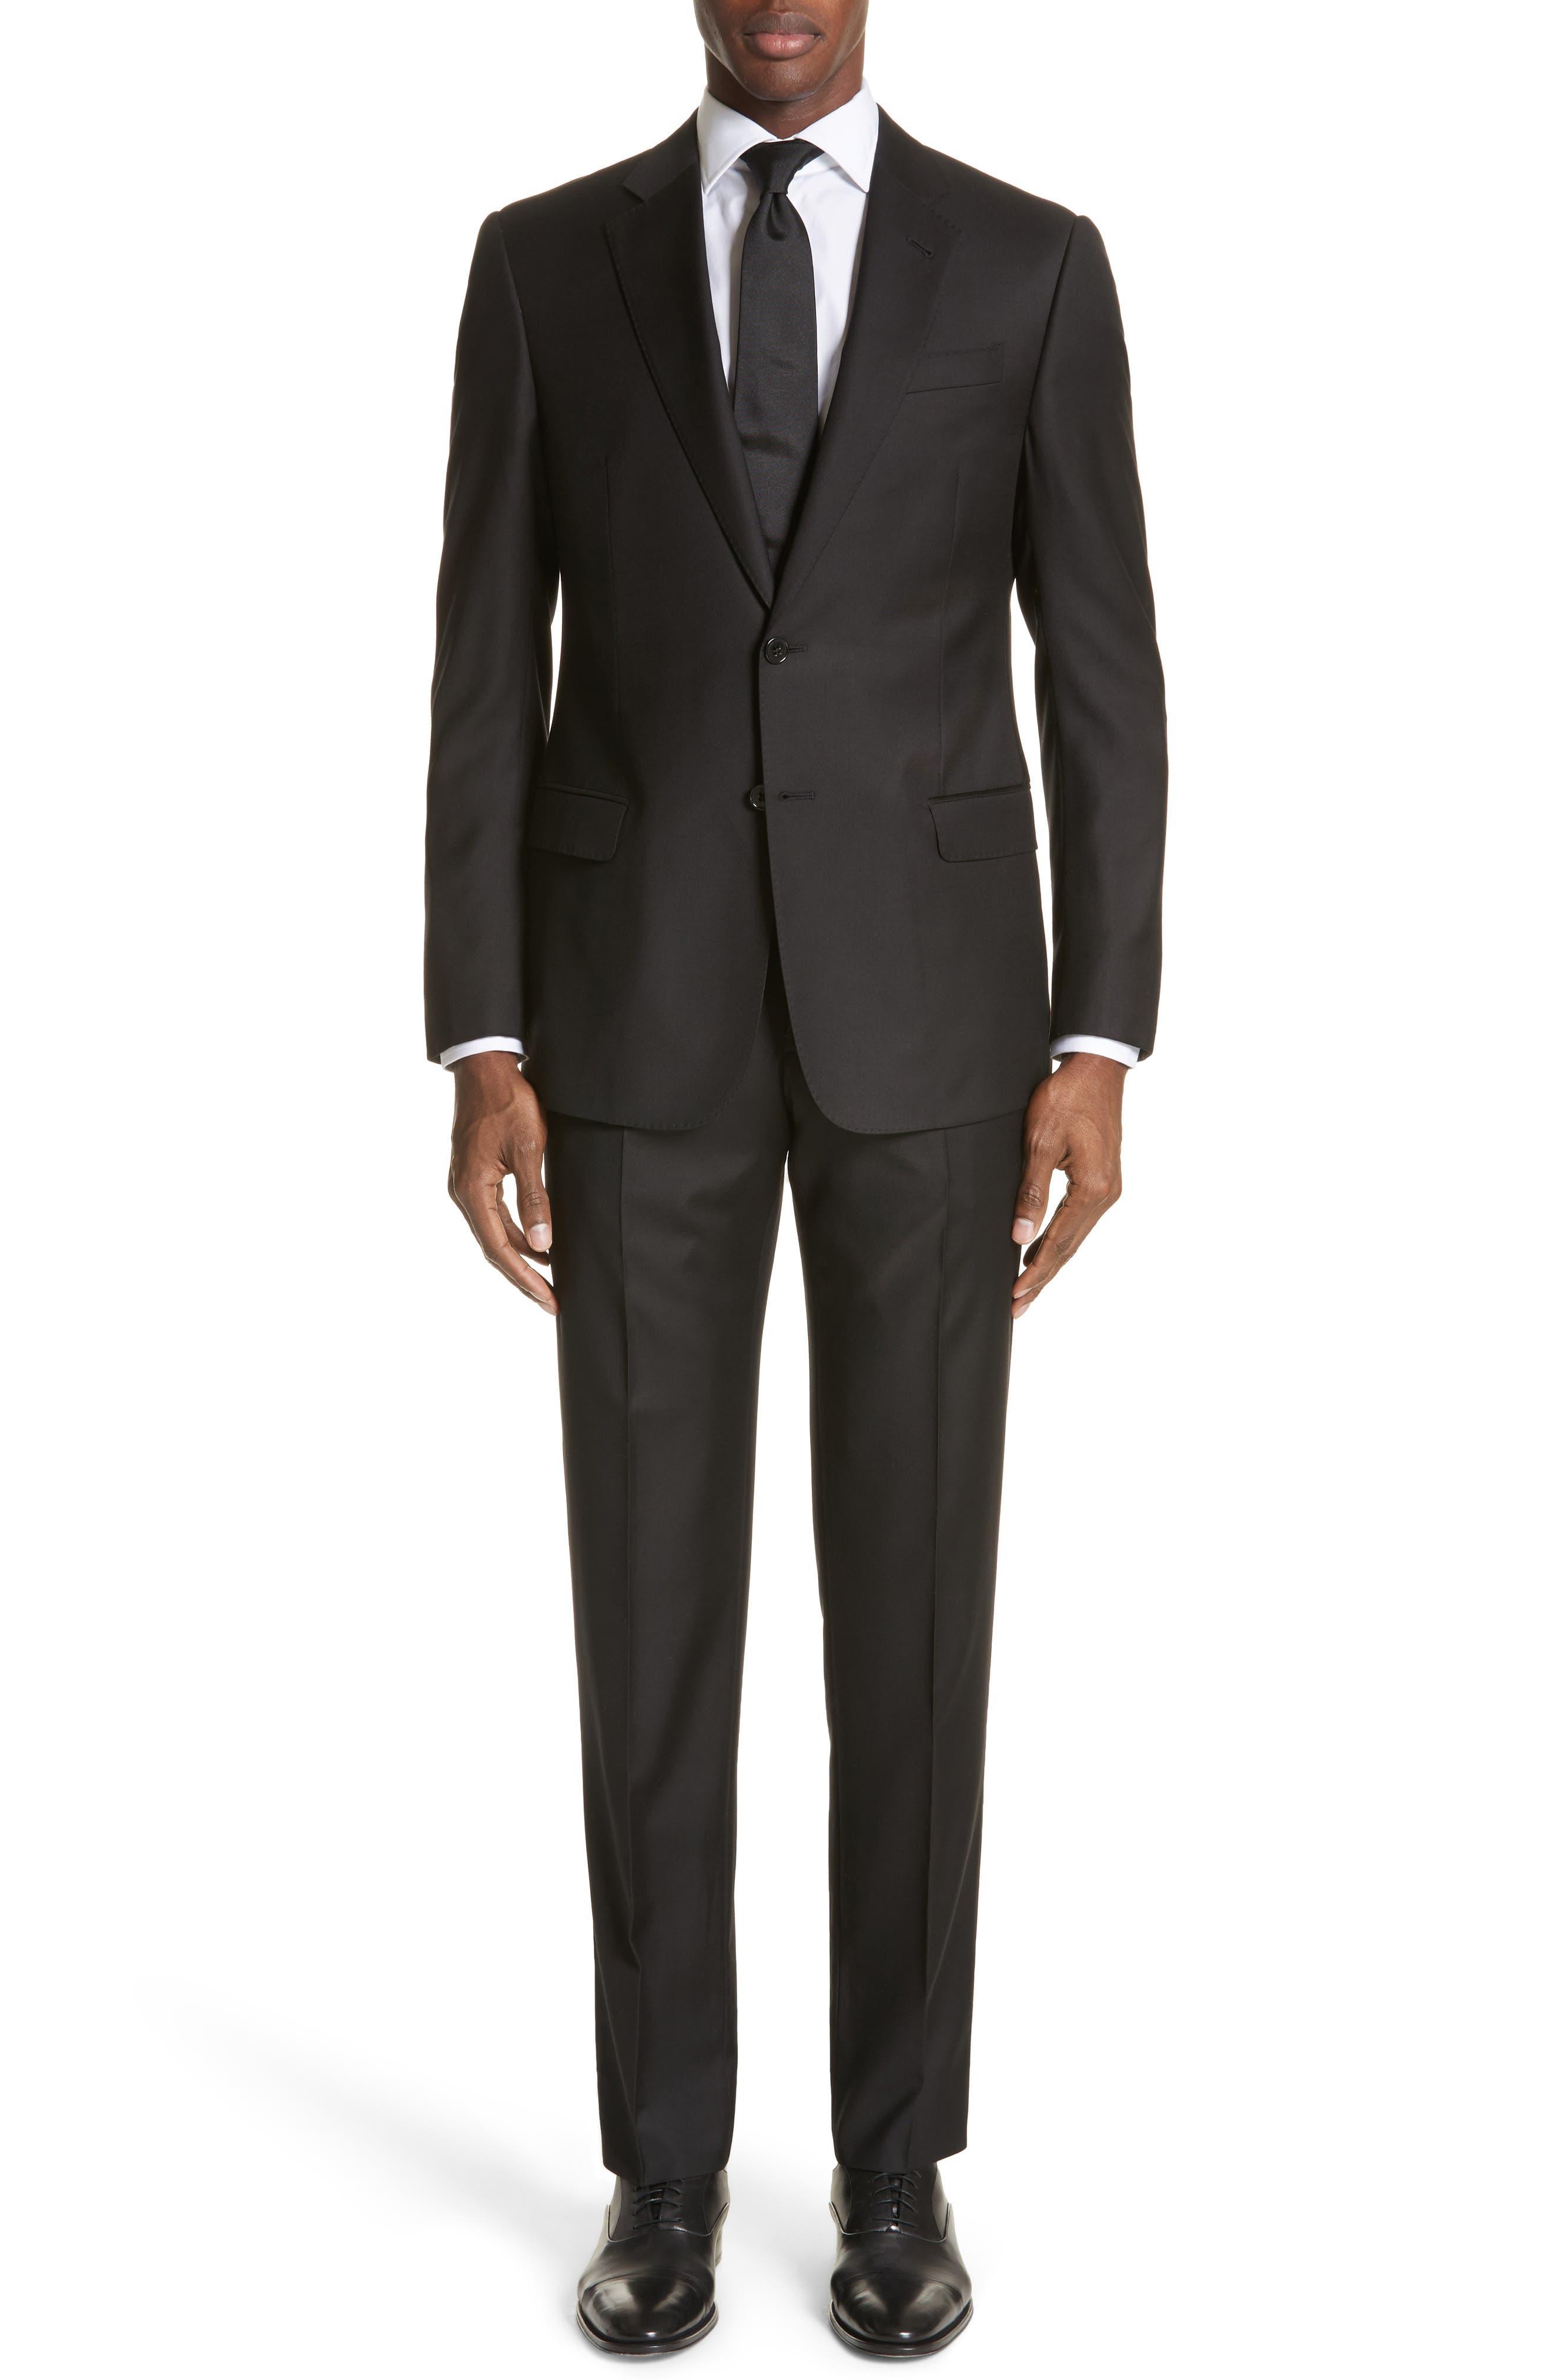 EMPORIO ARMANI, Trim Fit Solid Wool Suit, Main thumbnail 1, color, BLACK